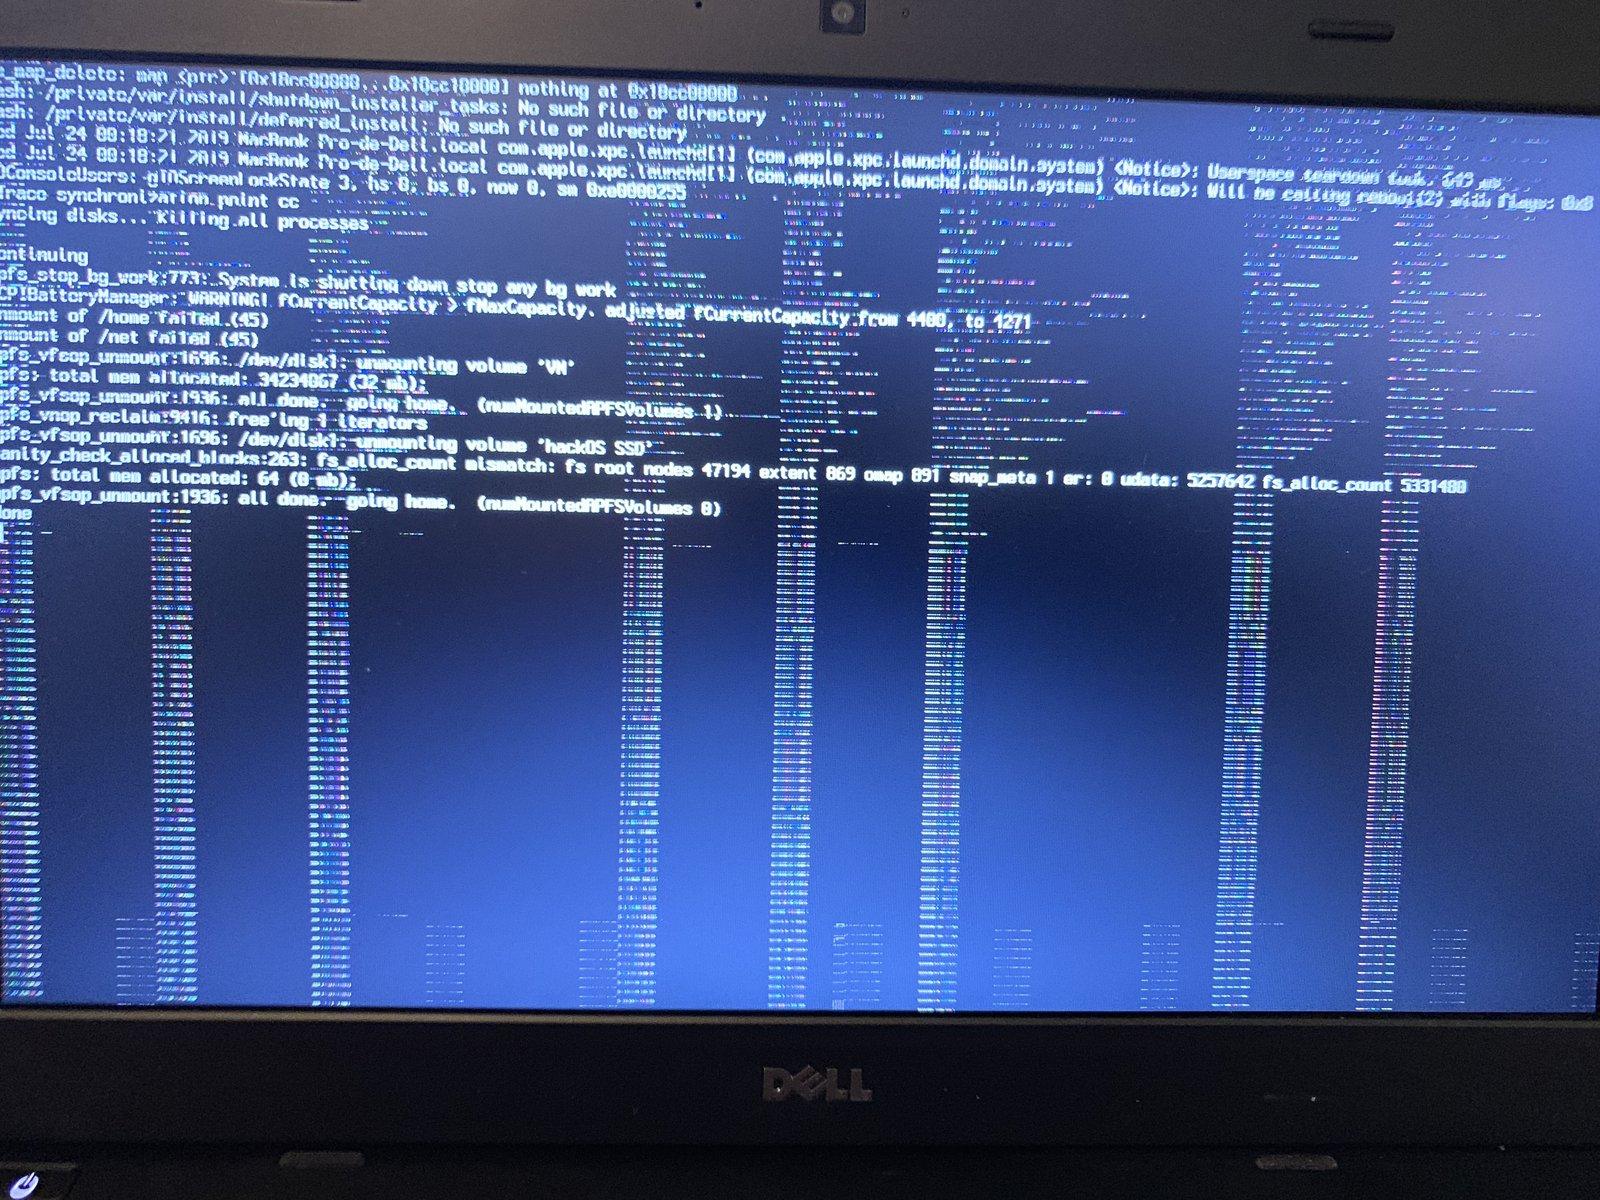 Résolu] Post-Install Dell Latitude 3330 - Demande dossier